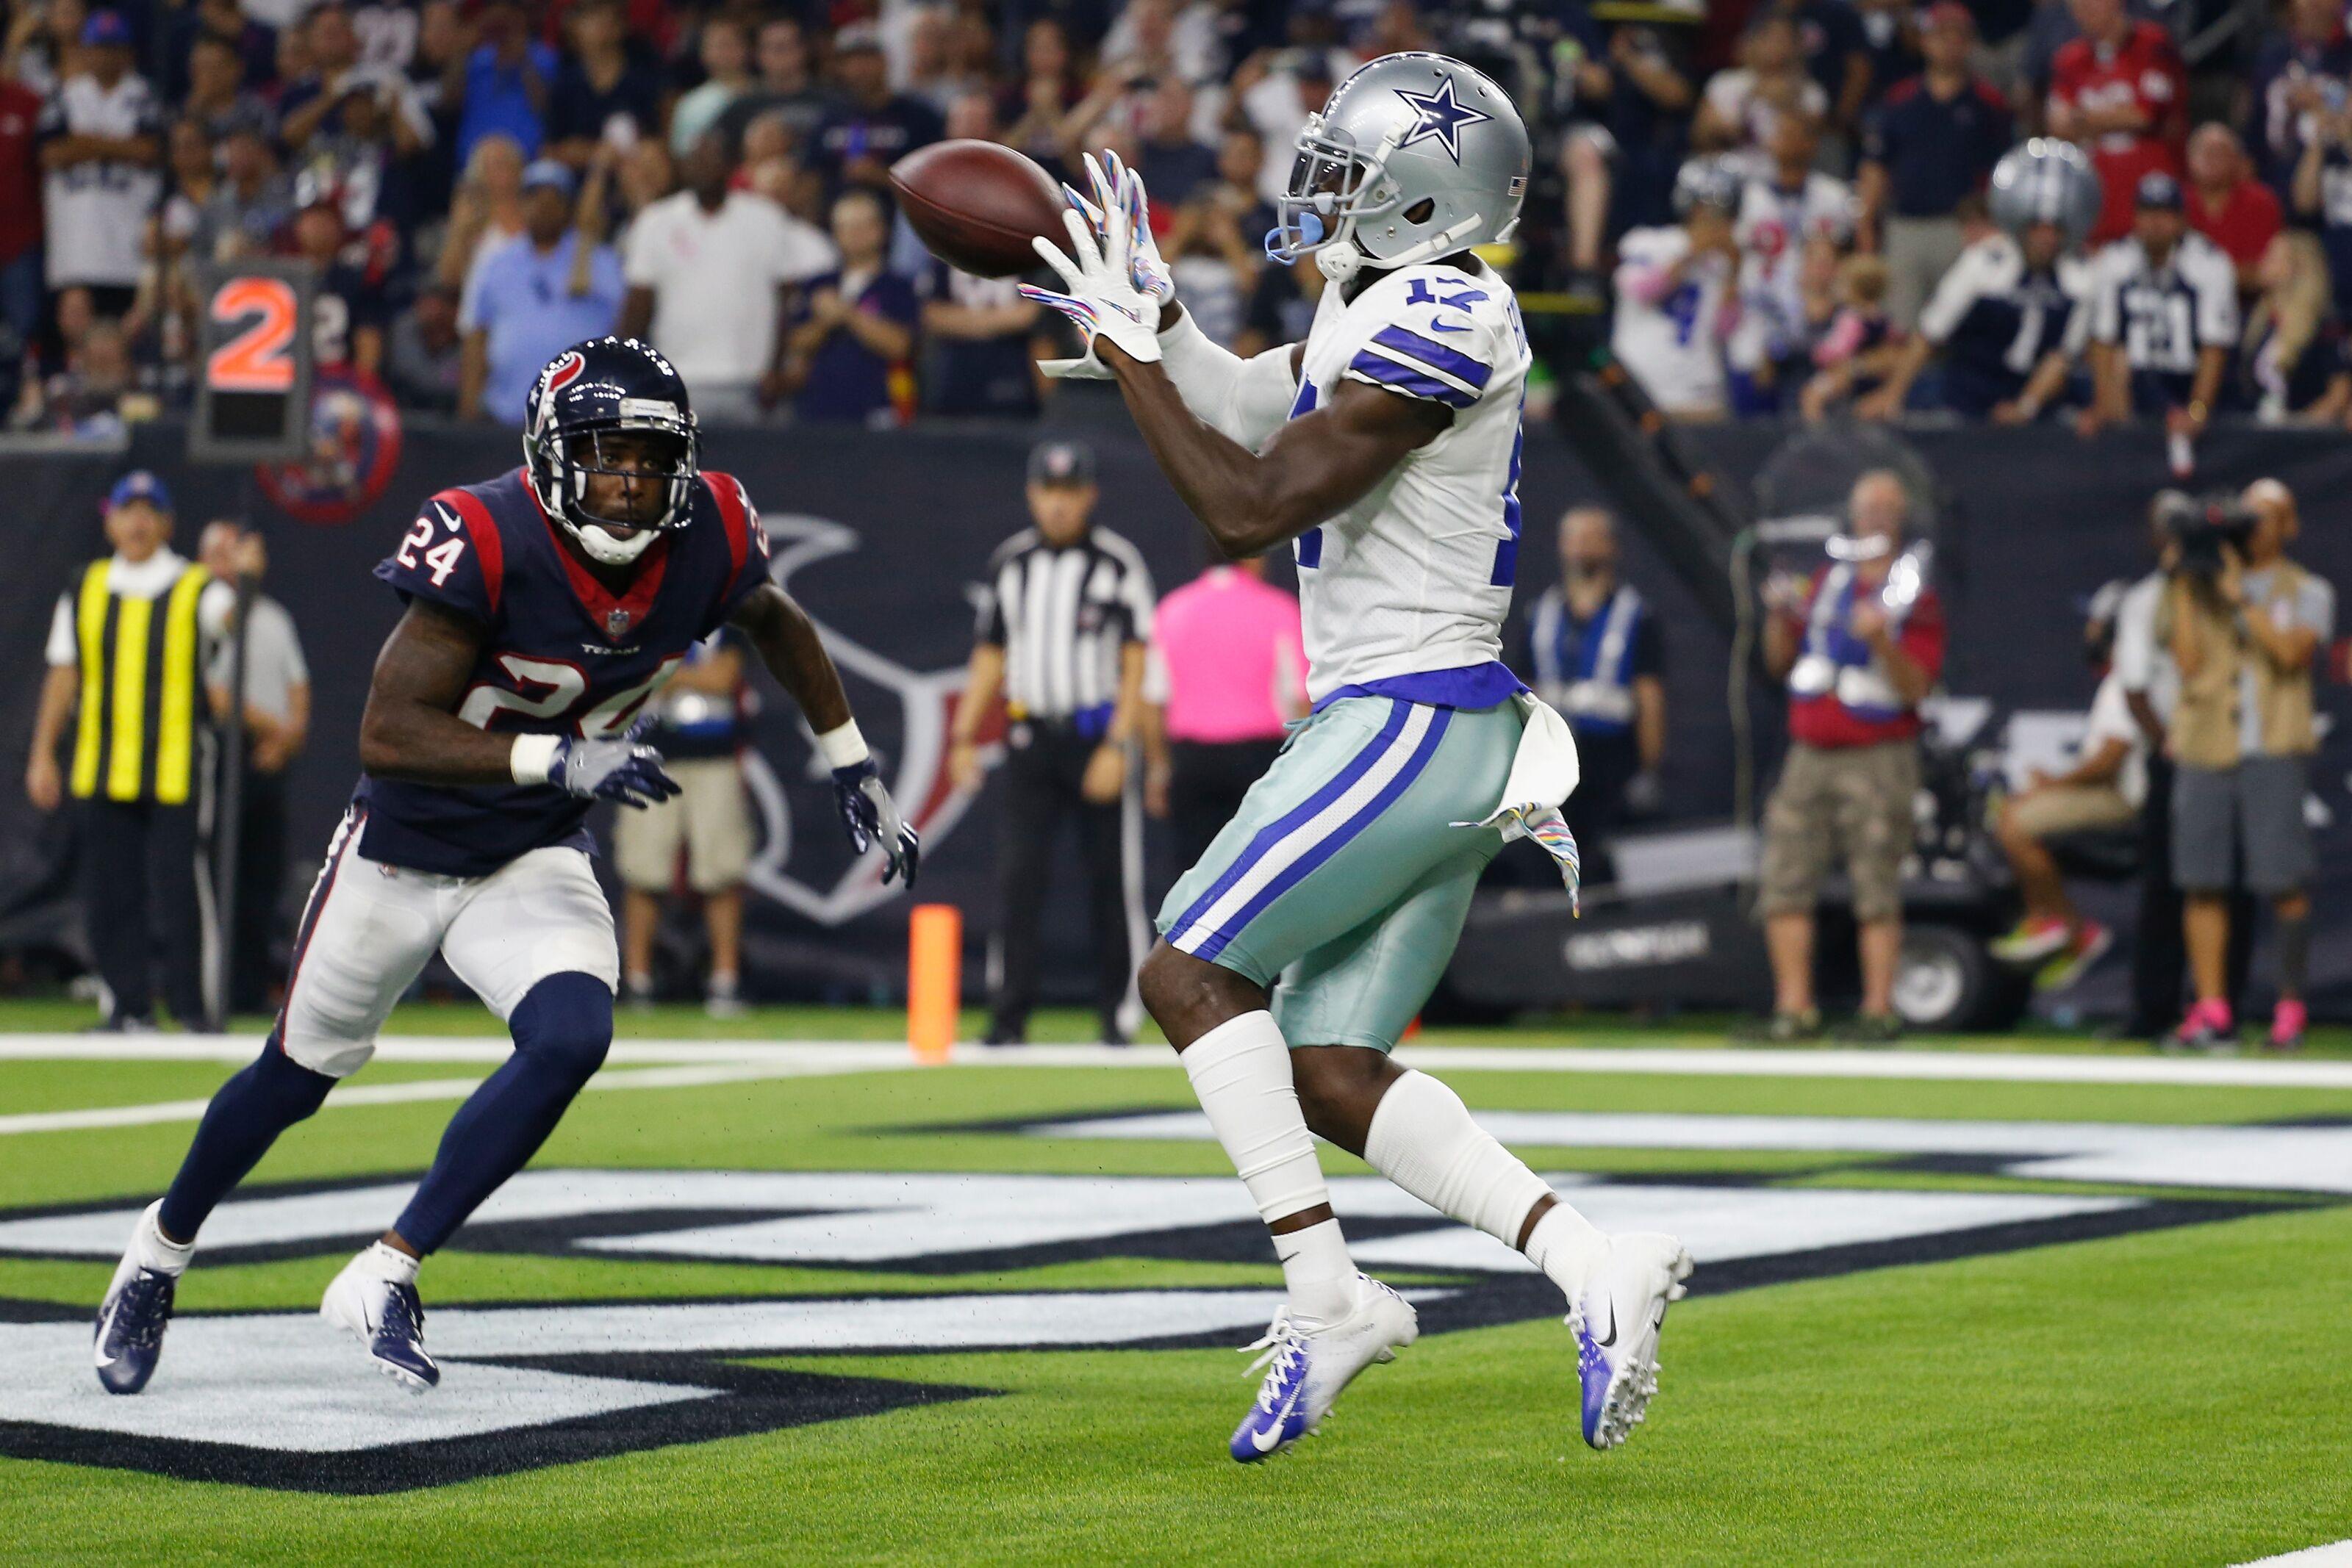 17c38fb31 Dallas Cowboys: 3 Big takeaways from loss vs. Texans in Week 5